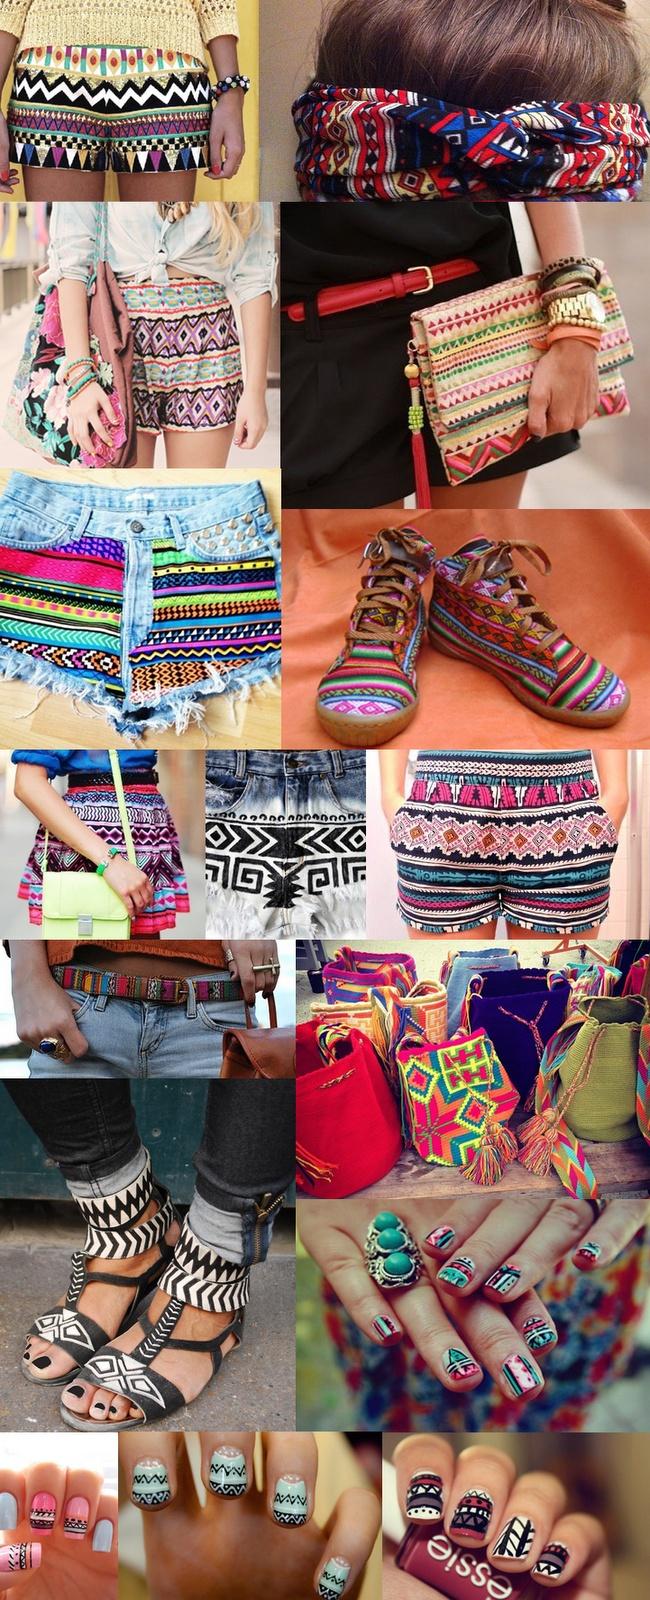 Amo Moda Blog - Estampa étnica